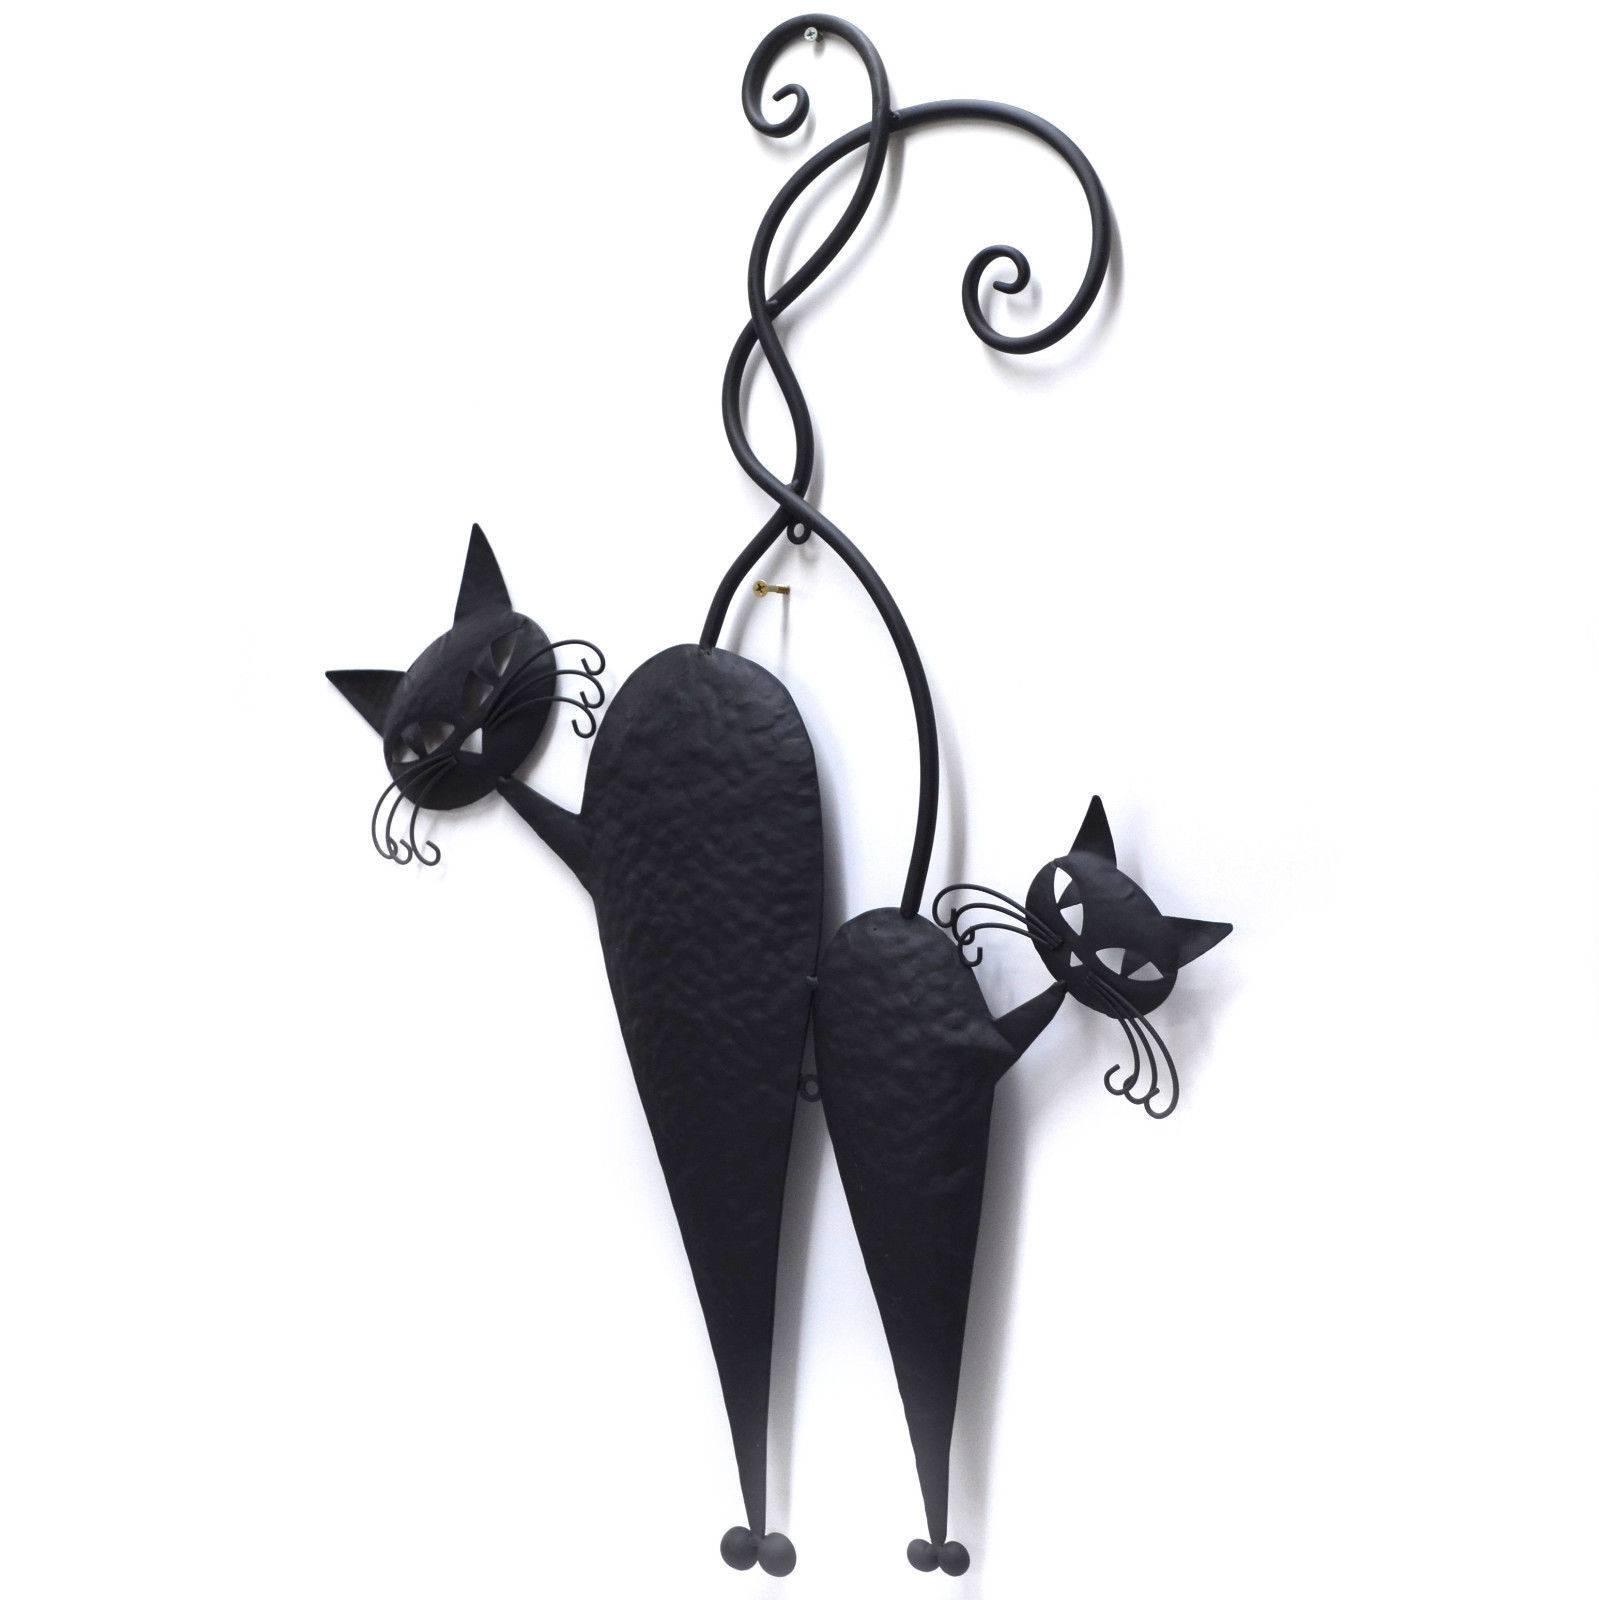 Cat Pair Metal Wall Art Black 71cm Throughout Most Popular Cat Metal Wall Art (View 16 of 20)